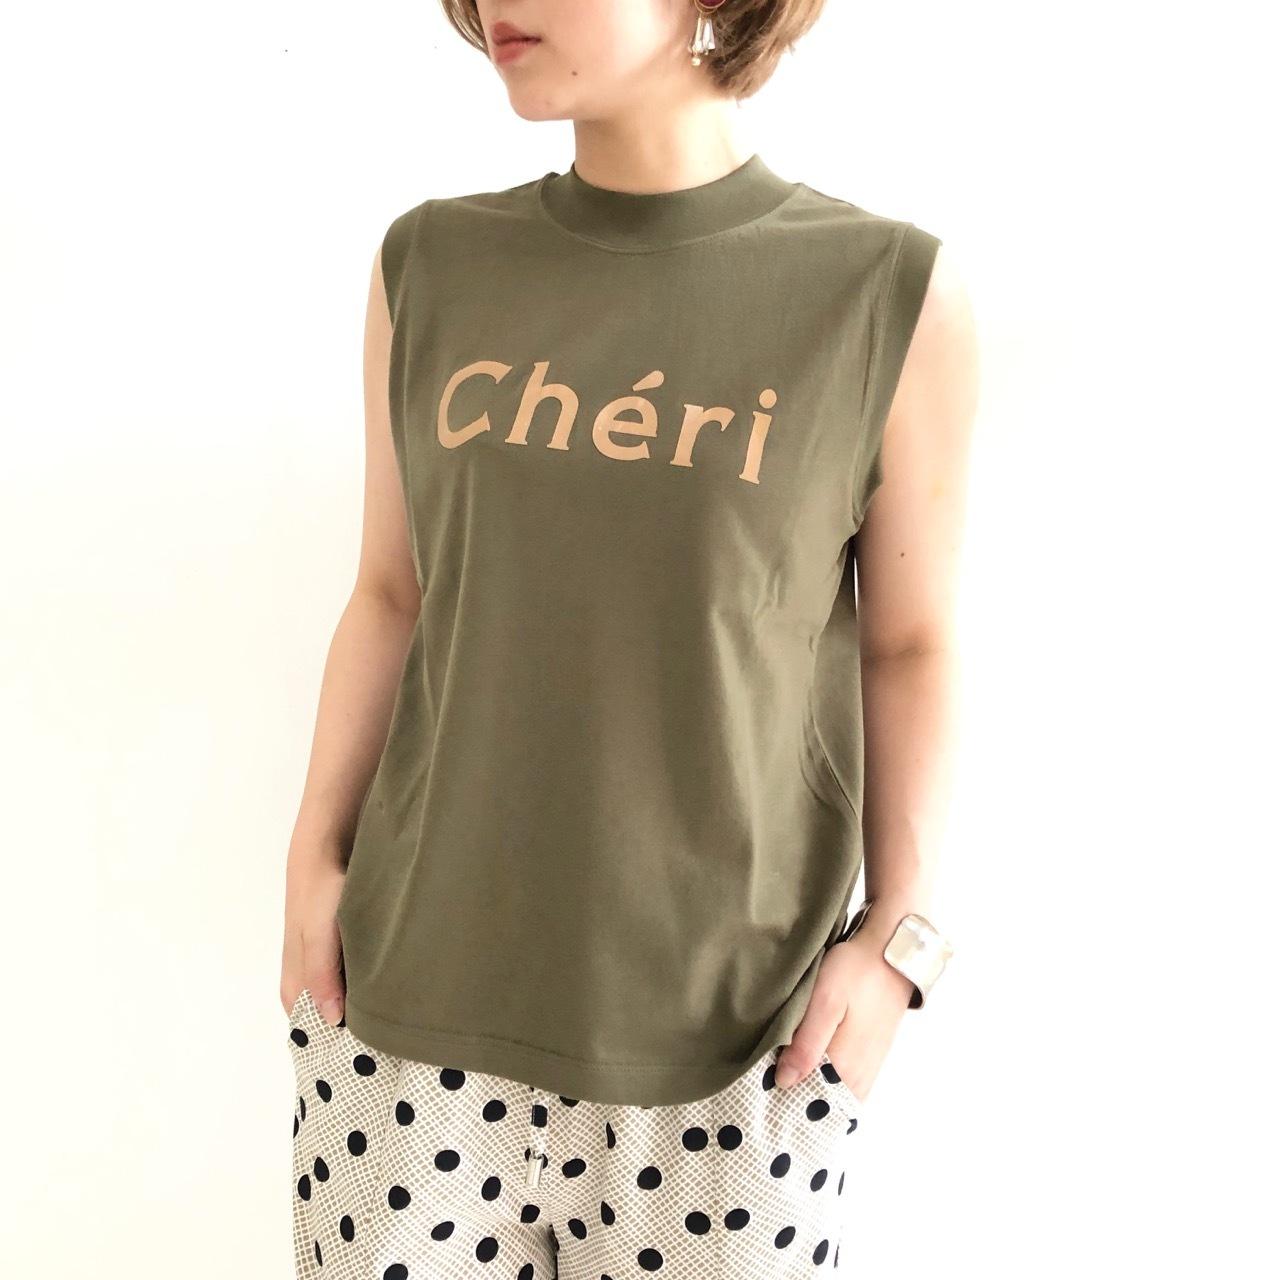 【 AGNOST 】- 64419121 - Cheri TankTeeシャツ